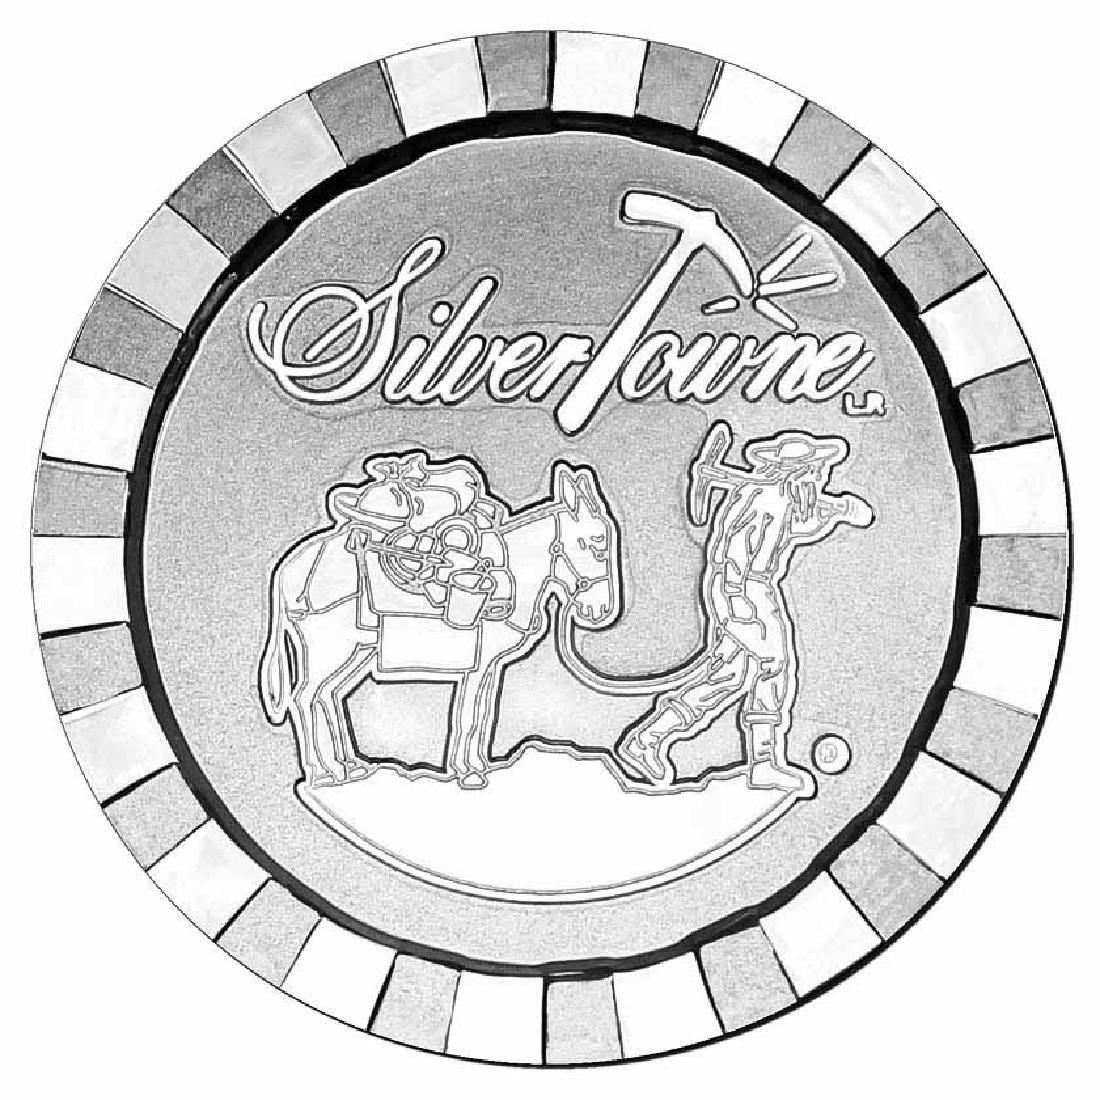 SilverTowne 1 oz Silver Round - Stackable Poker Chip De